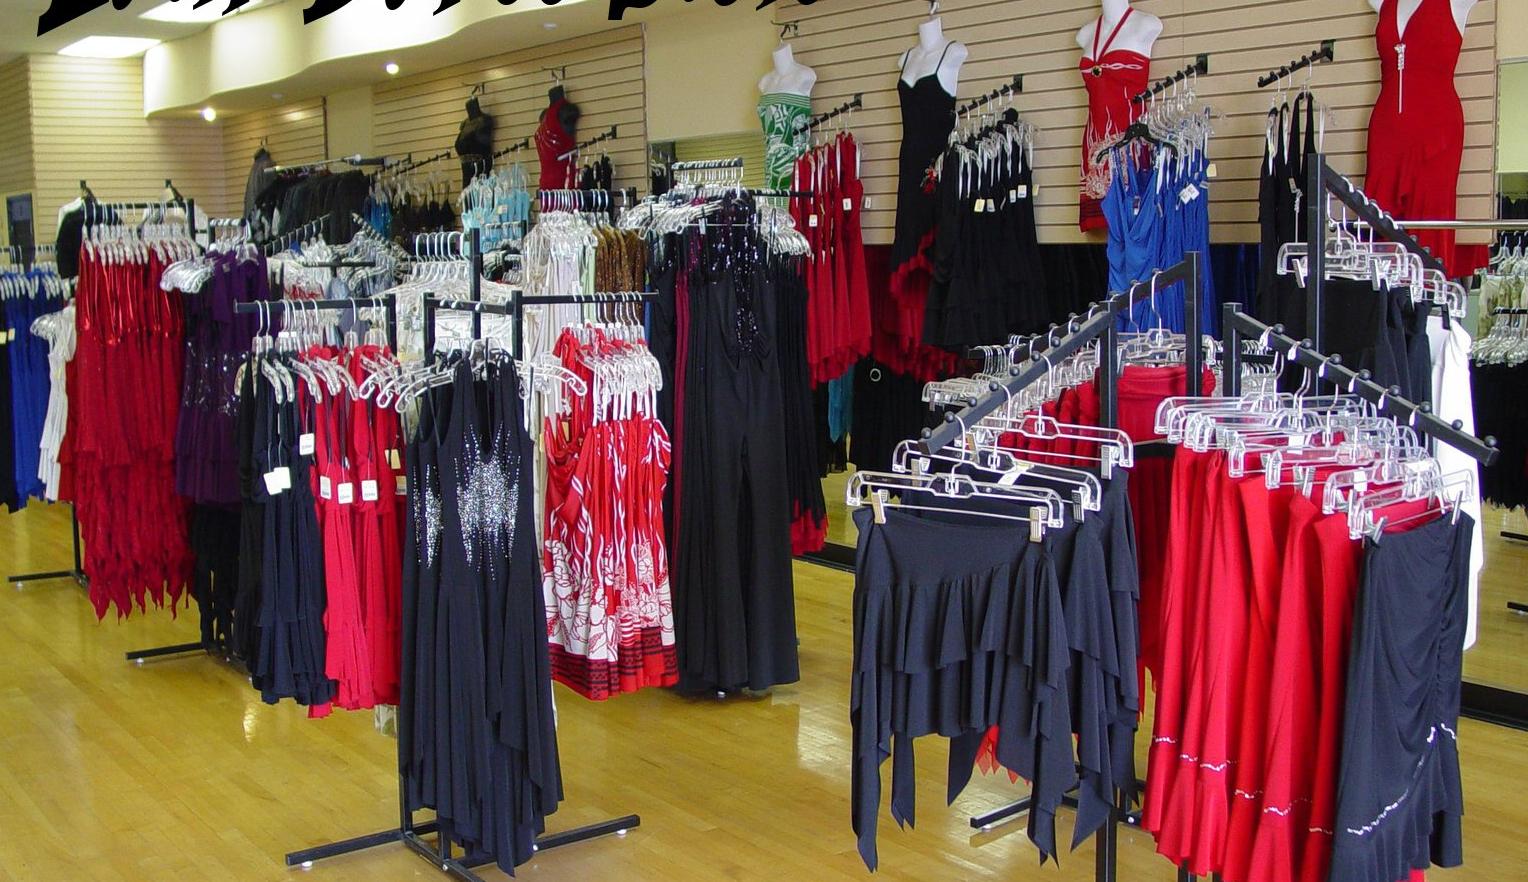 Sun clothing store